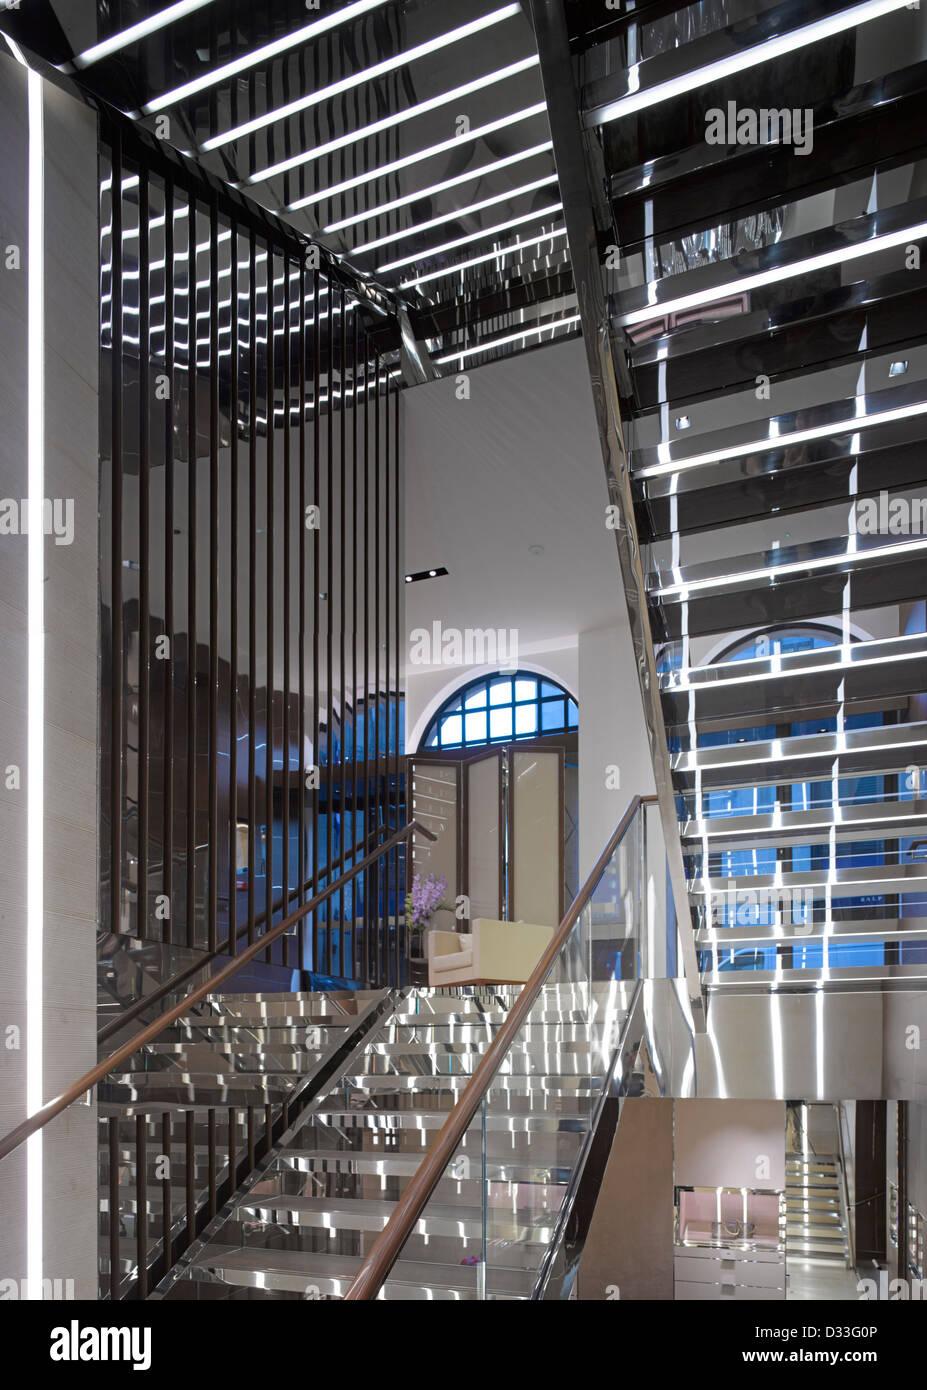 Salvatore Ferragamo Bond Street, London, United Kingdom. Architect: MPA Architects, 2012. - Stock Image